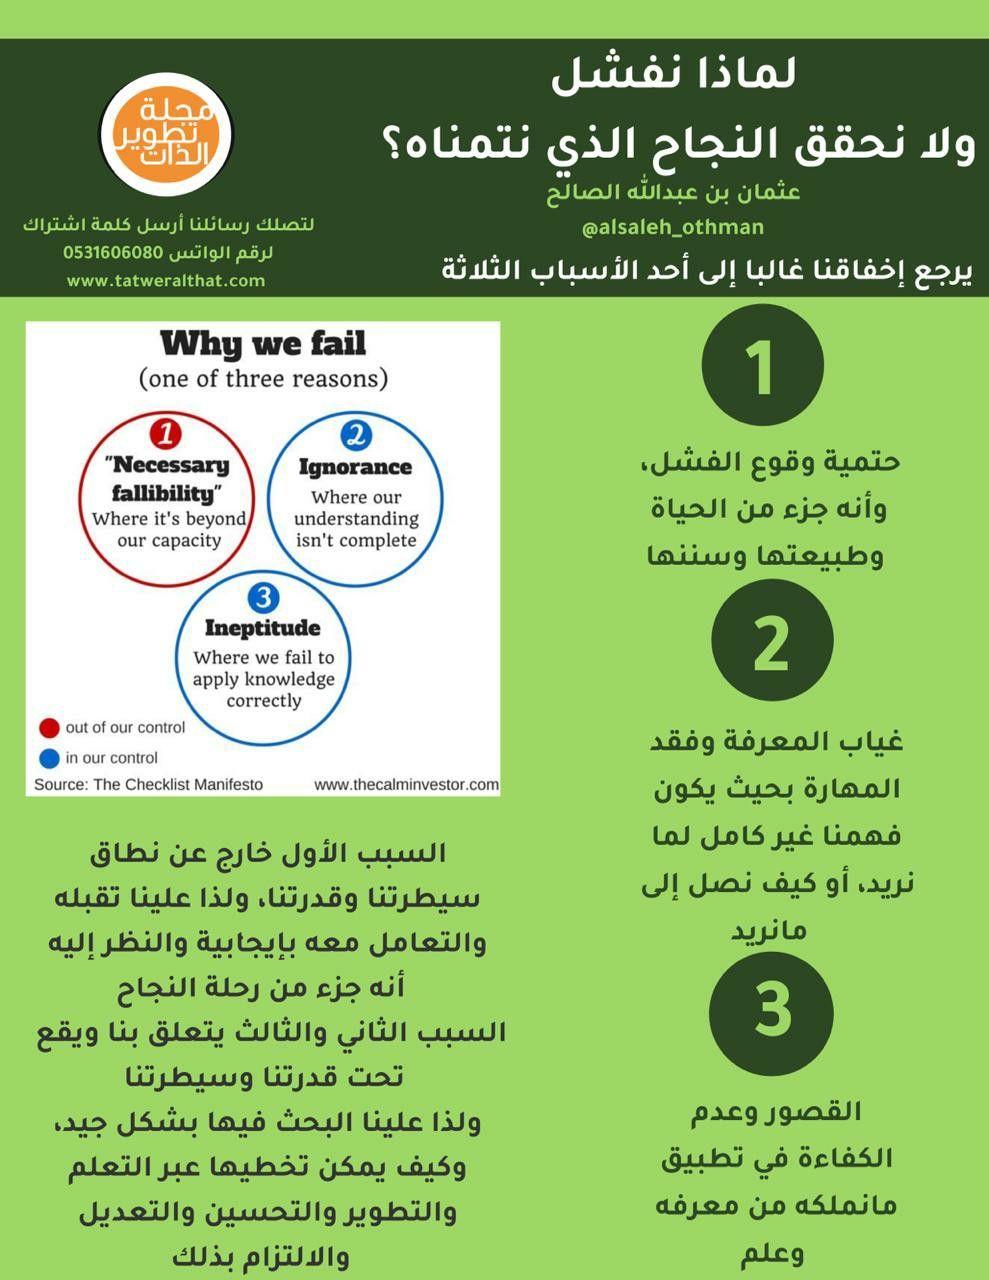 Pin By أسعد فرحان الفيفي On مختارات تطوير ذاتي وصحي وإداري Fails Map